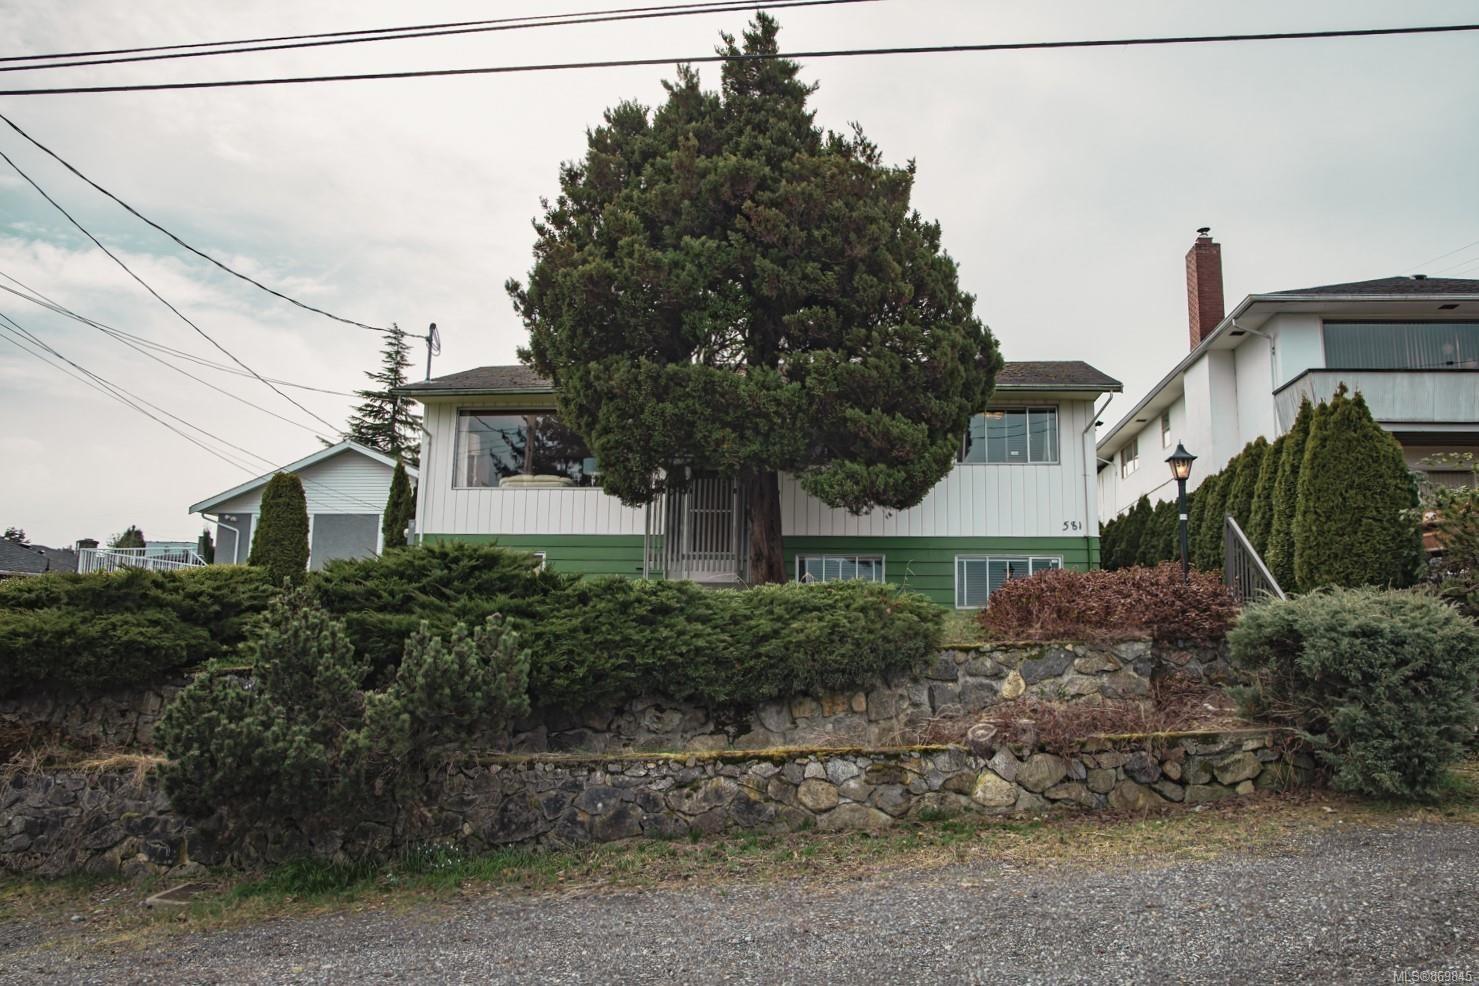 Main Photo: 581 Poplar St in : Na Brechin Hill House for sale (Nanaimo)  : MLS®# 869845